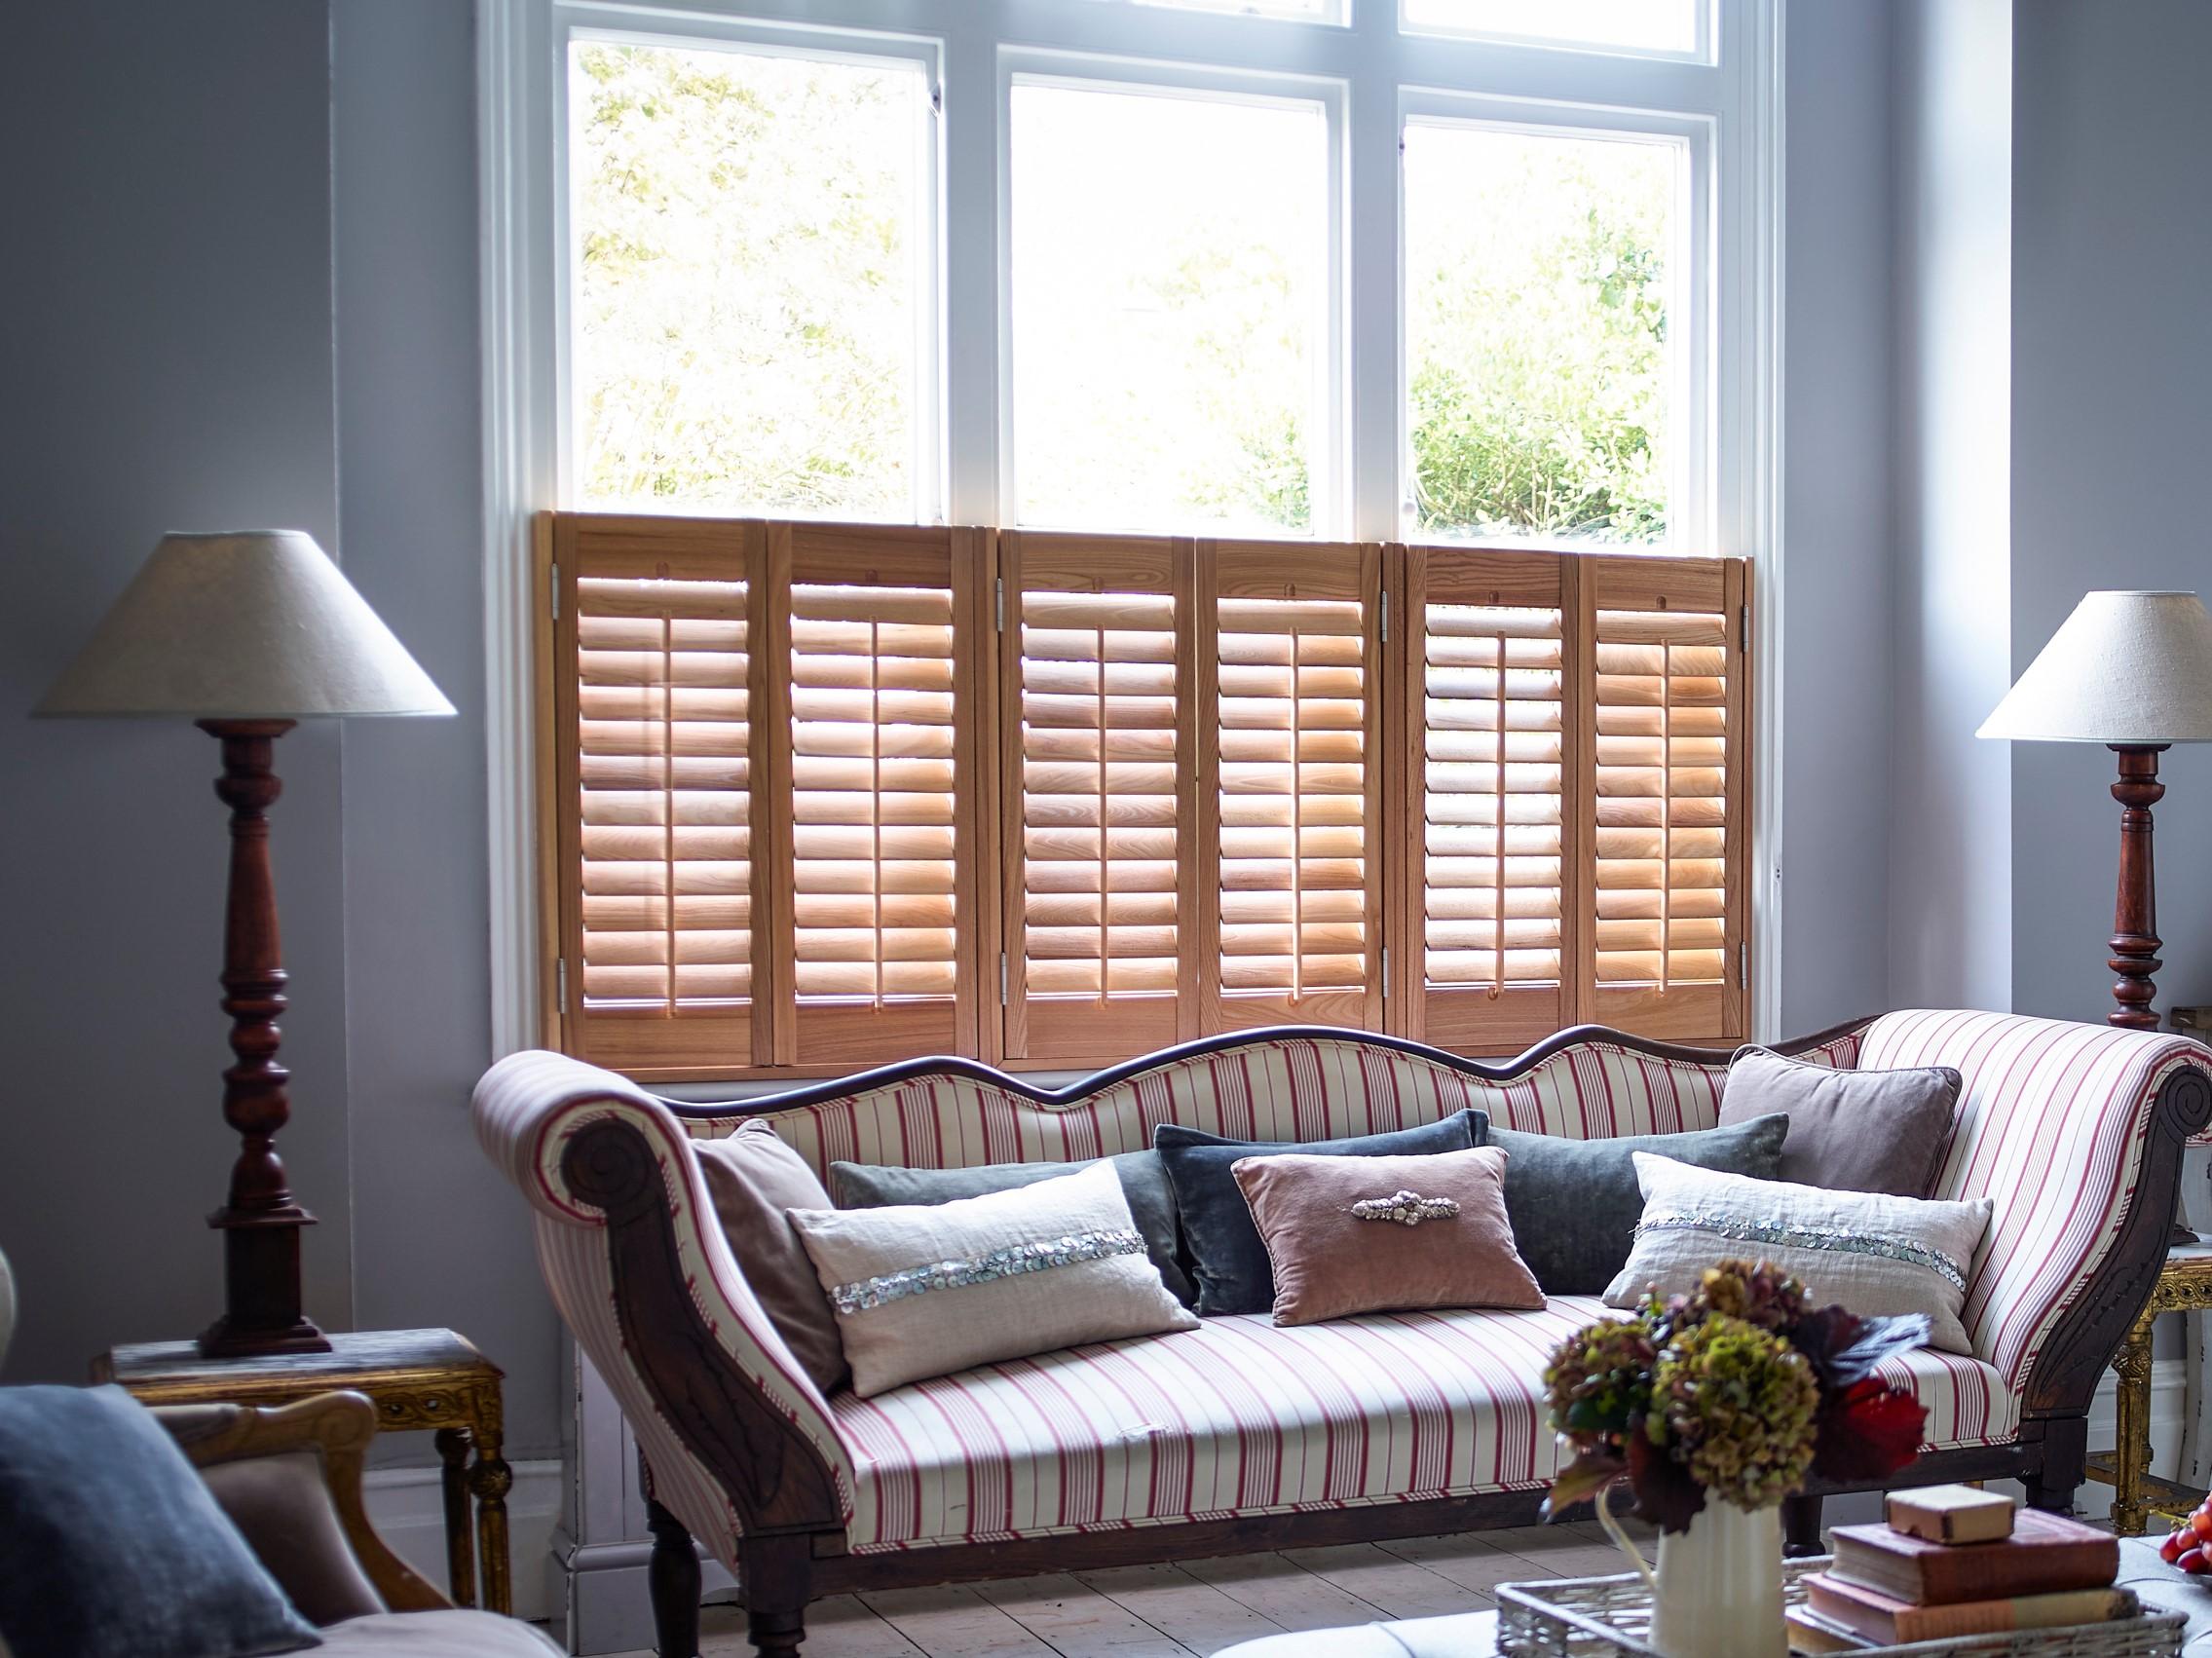 The benefits of shutters - DIY Shutters